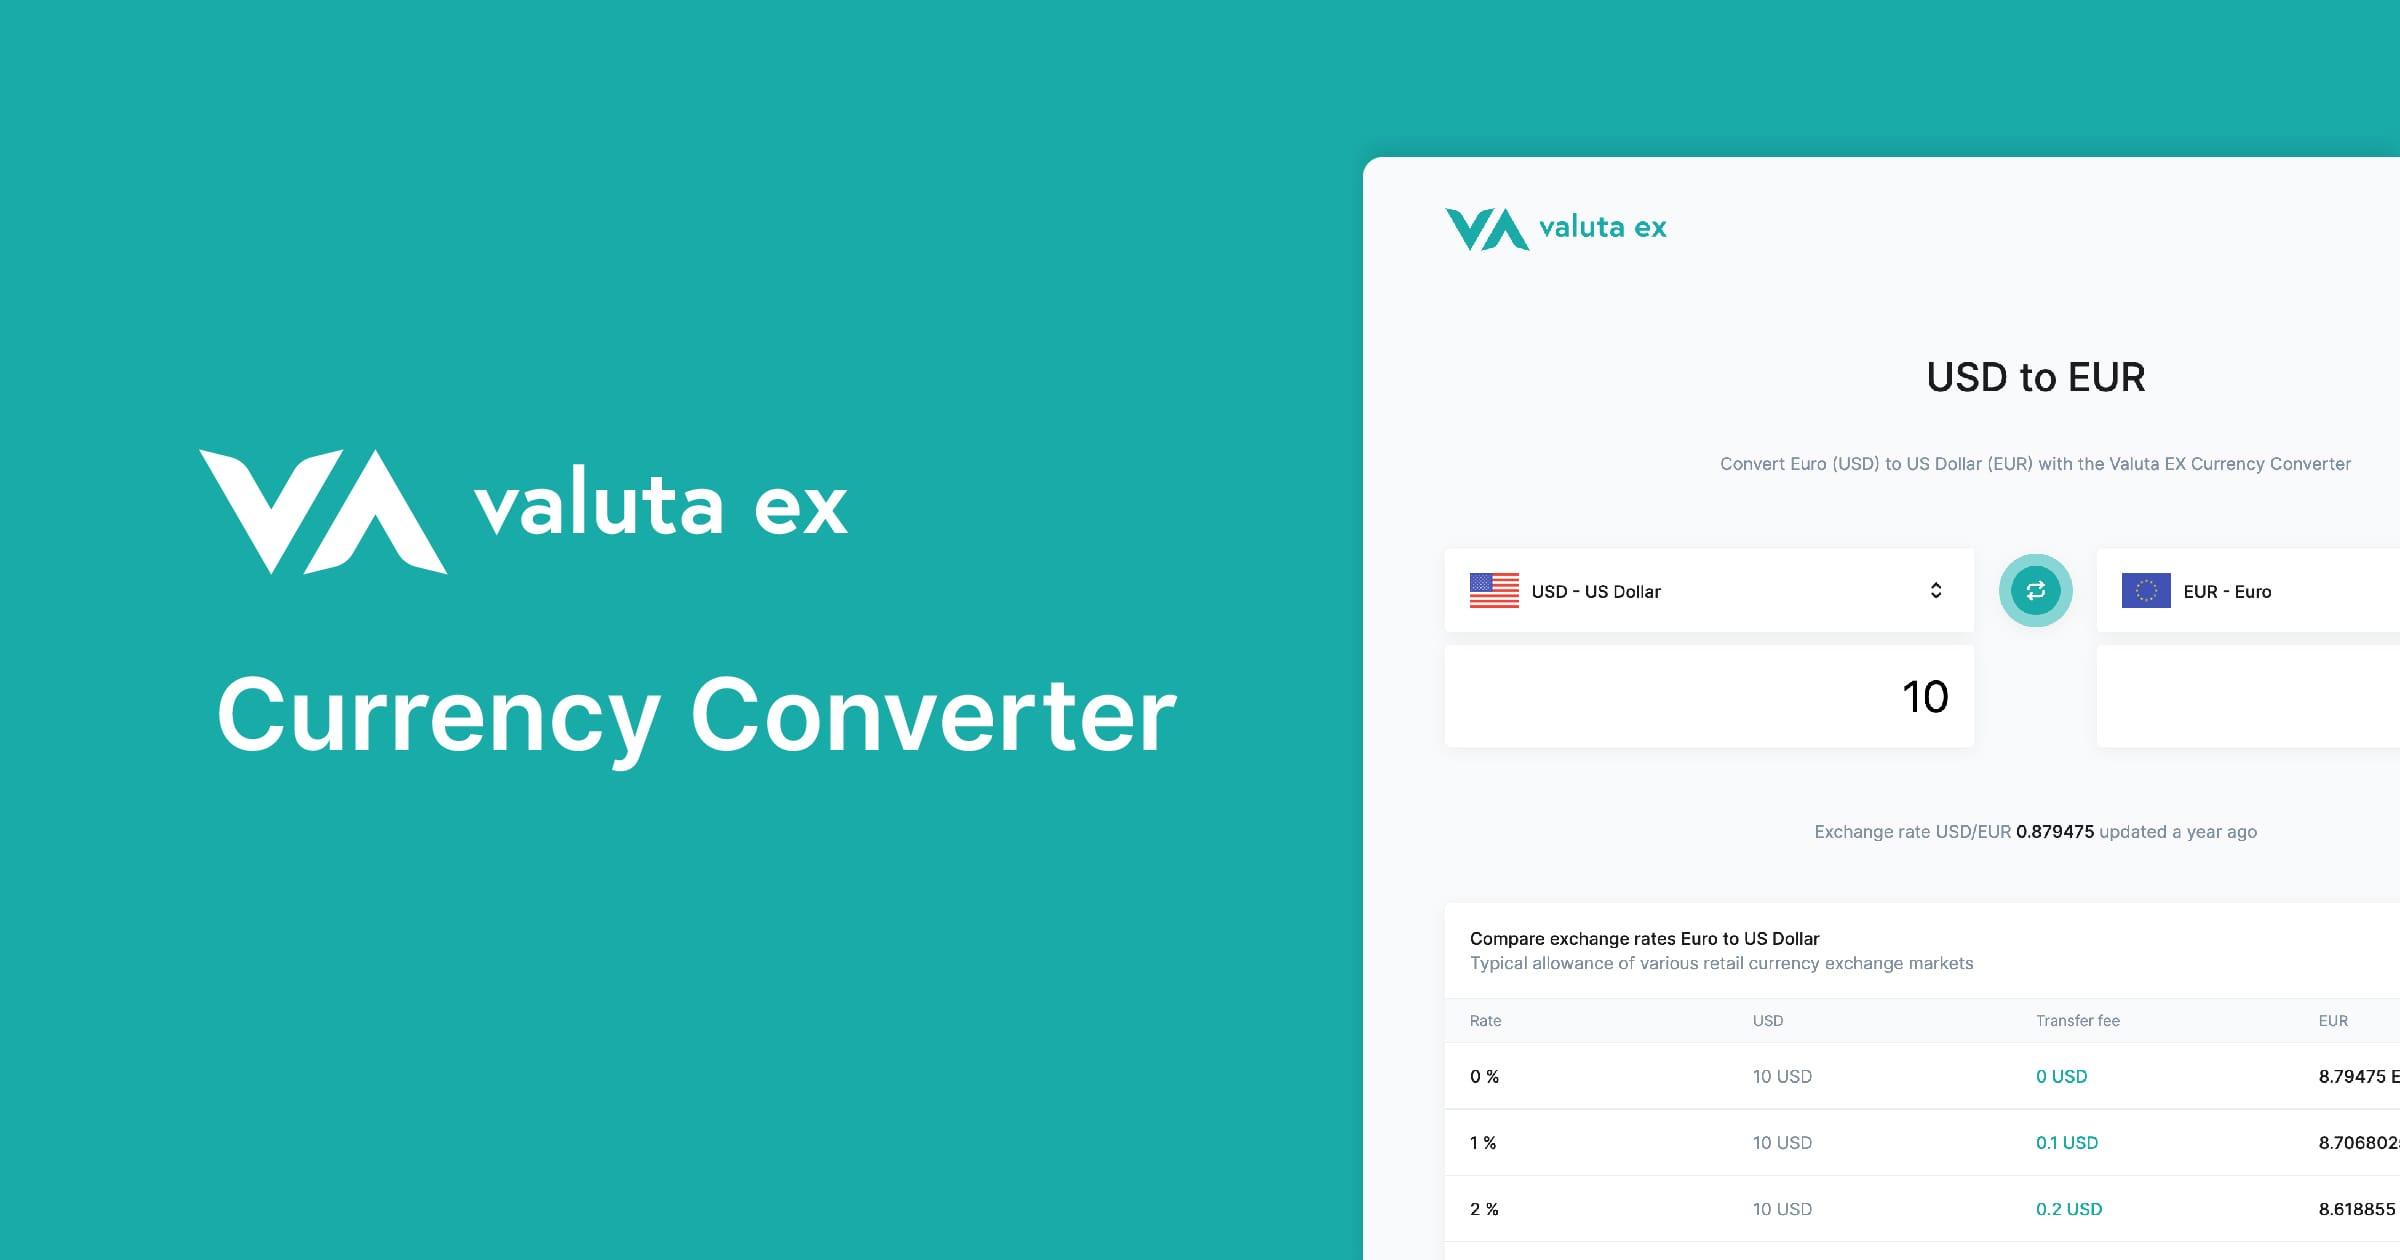 Valuta Ex Currency Converter